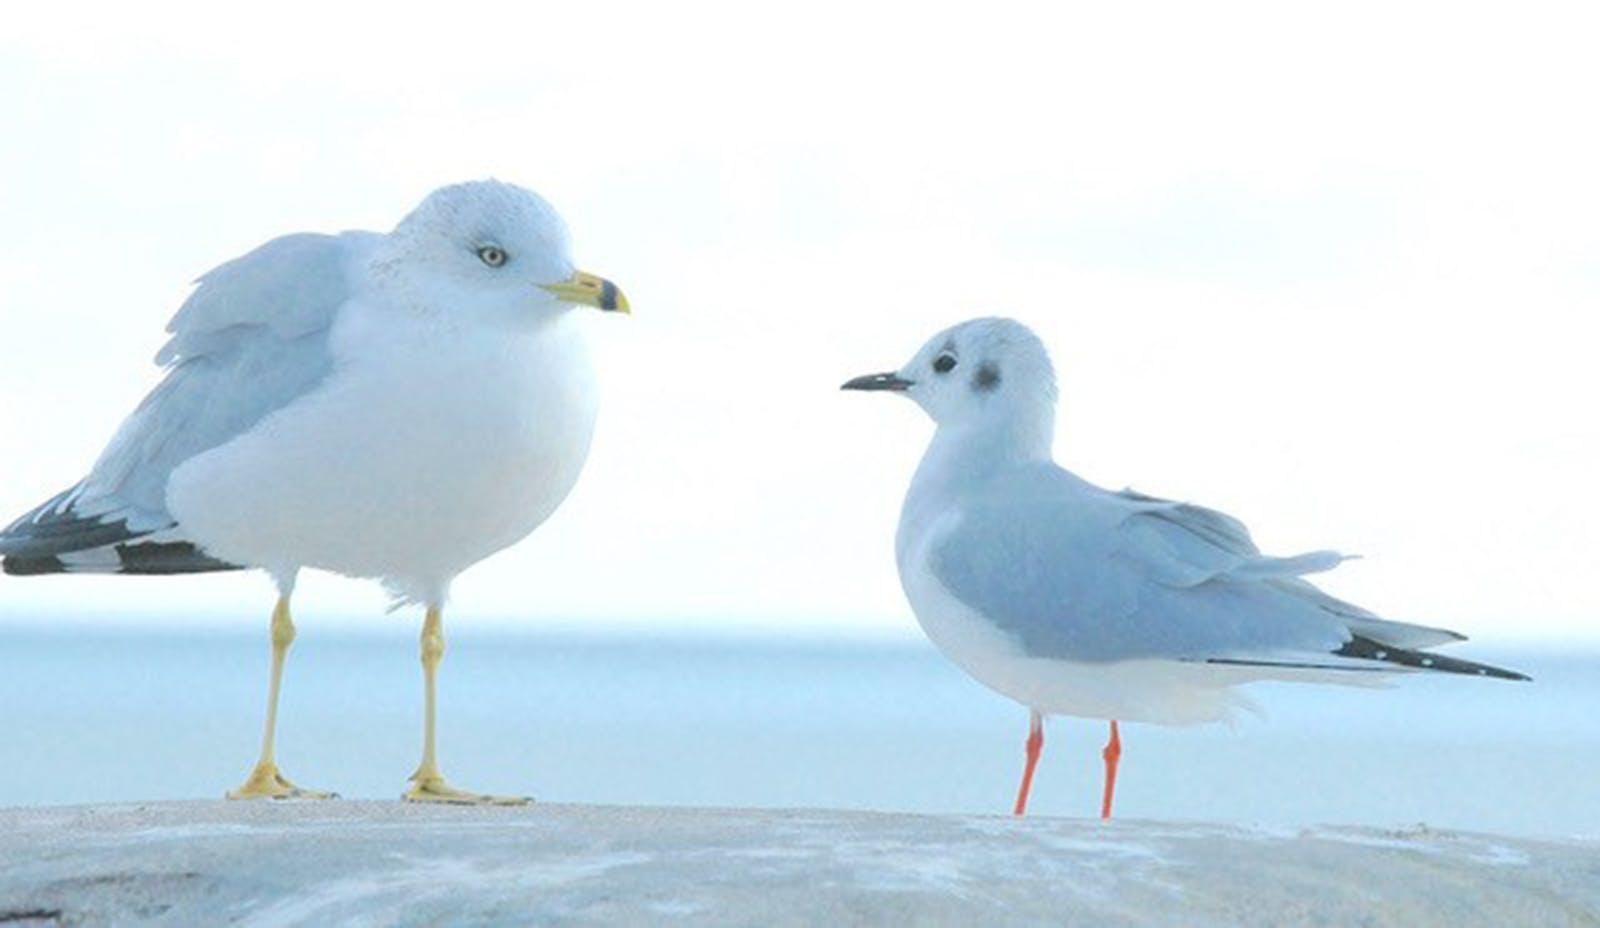 Ring-billed gull, left, Bonaparte's gull, right, both in winter plumage.